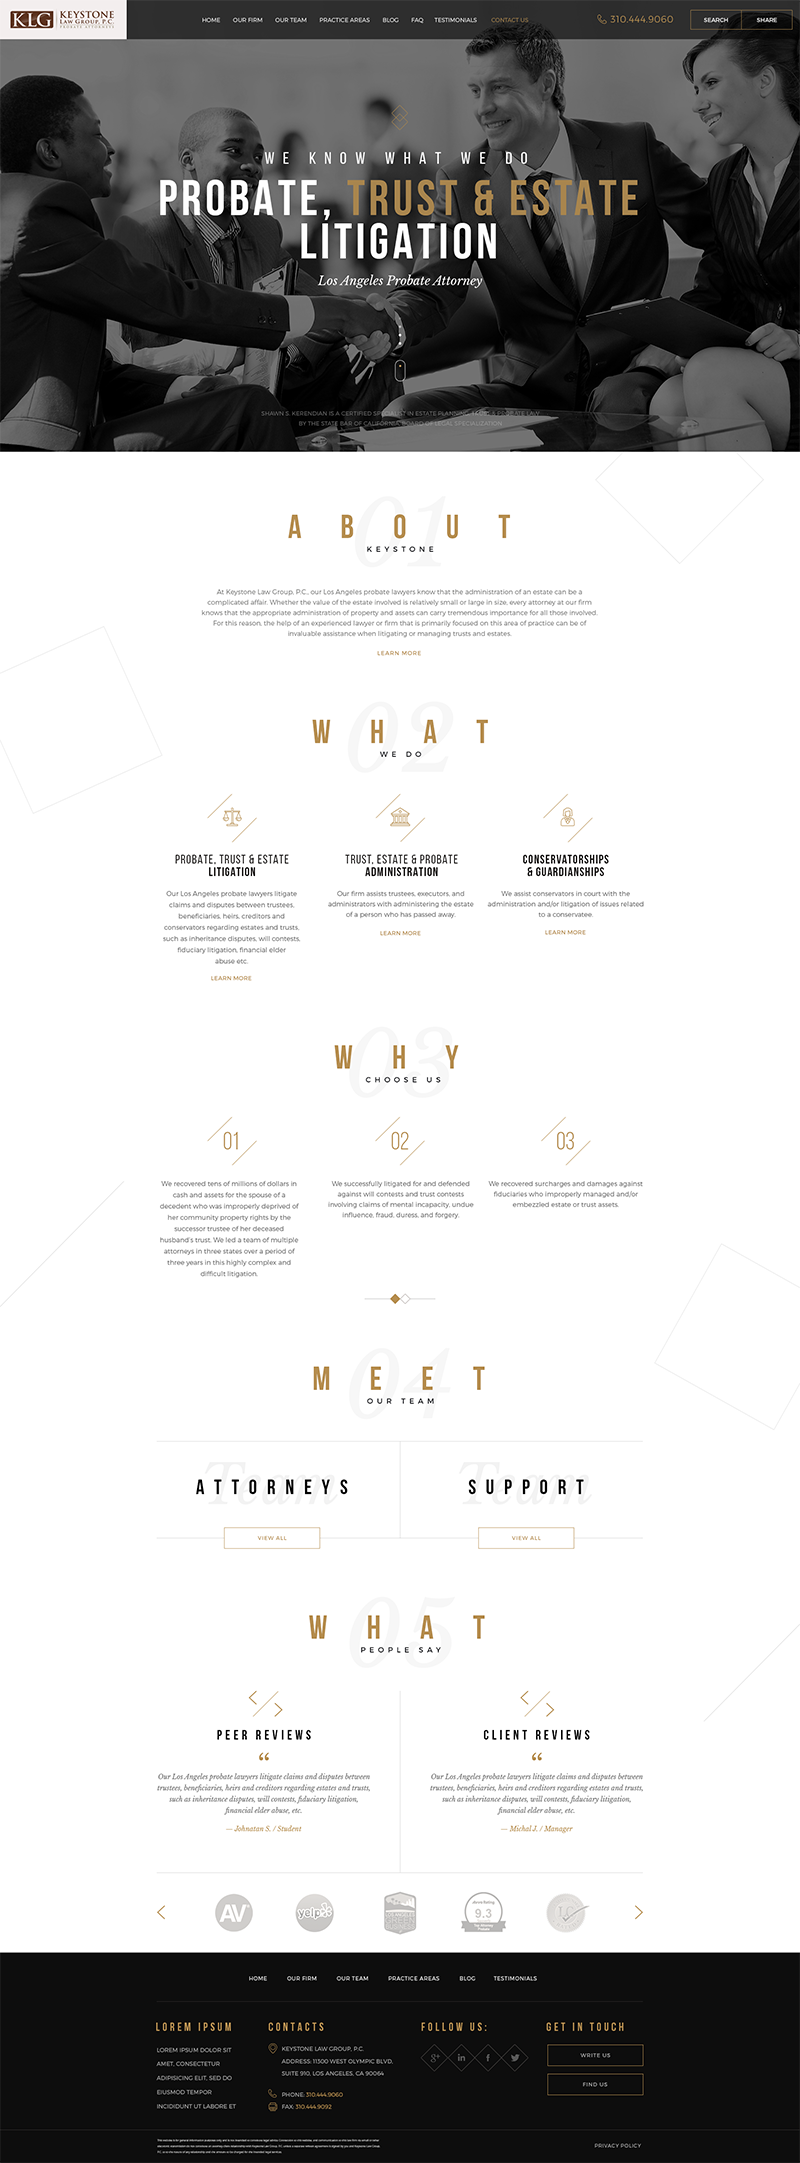 Keystone Web Design Web Design Portfolio Web Design Design